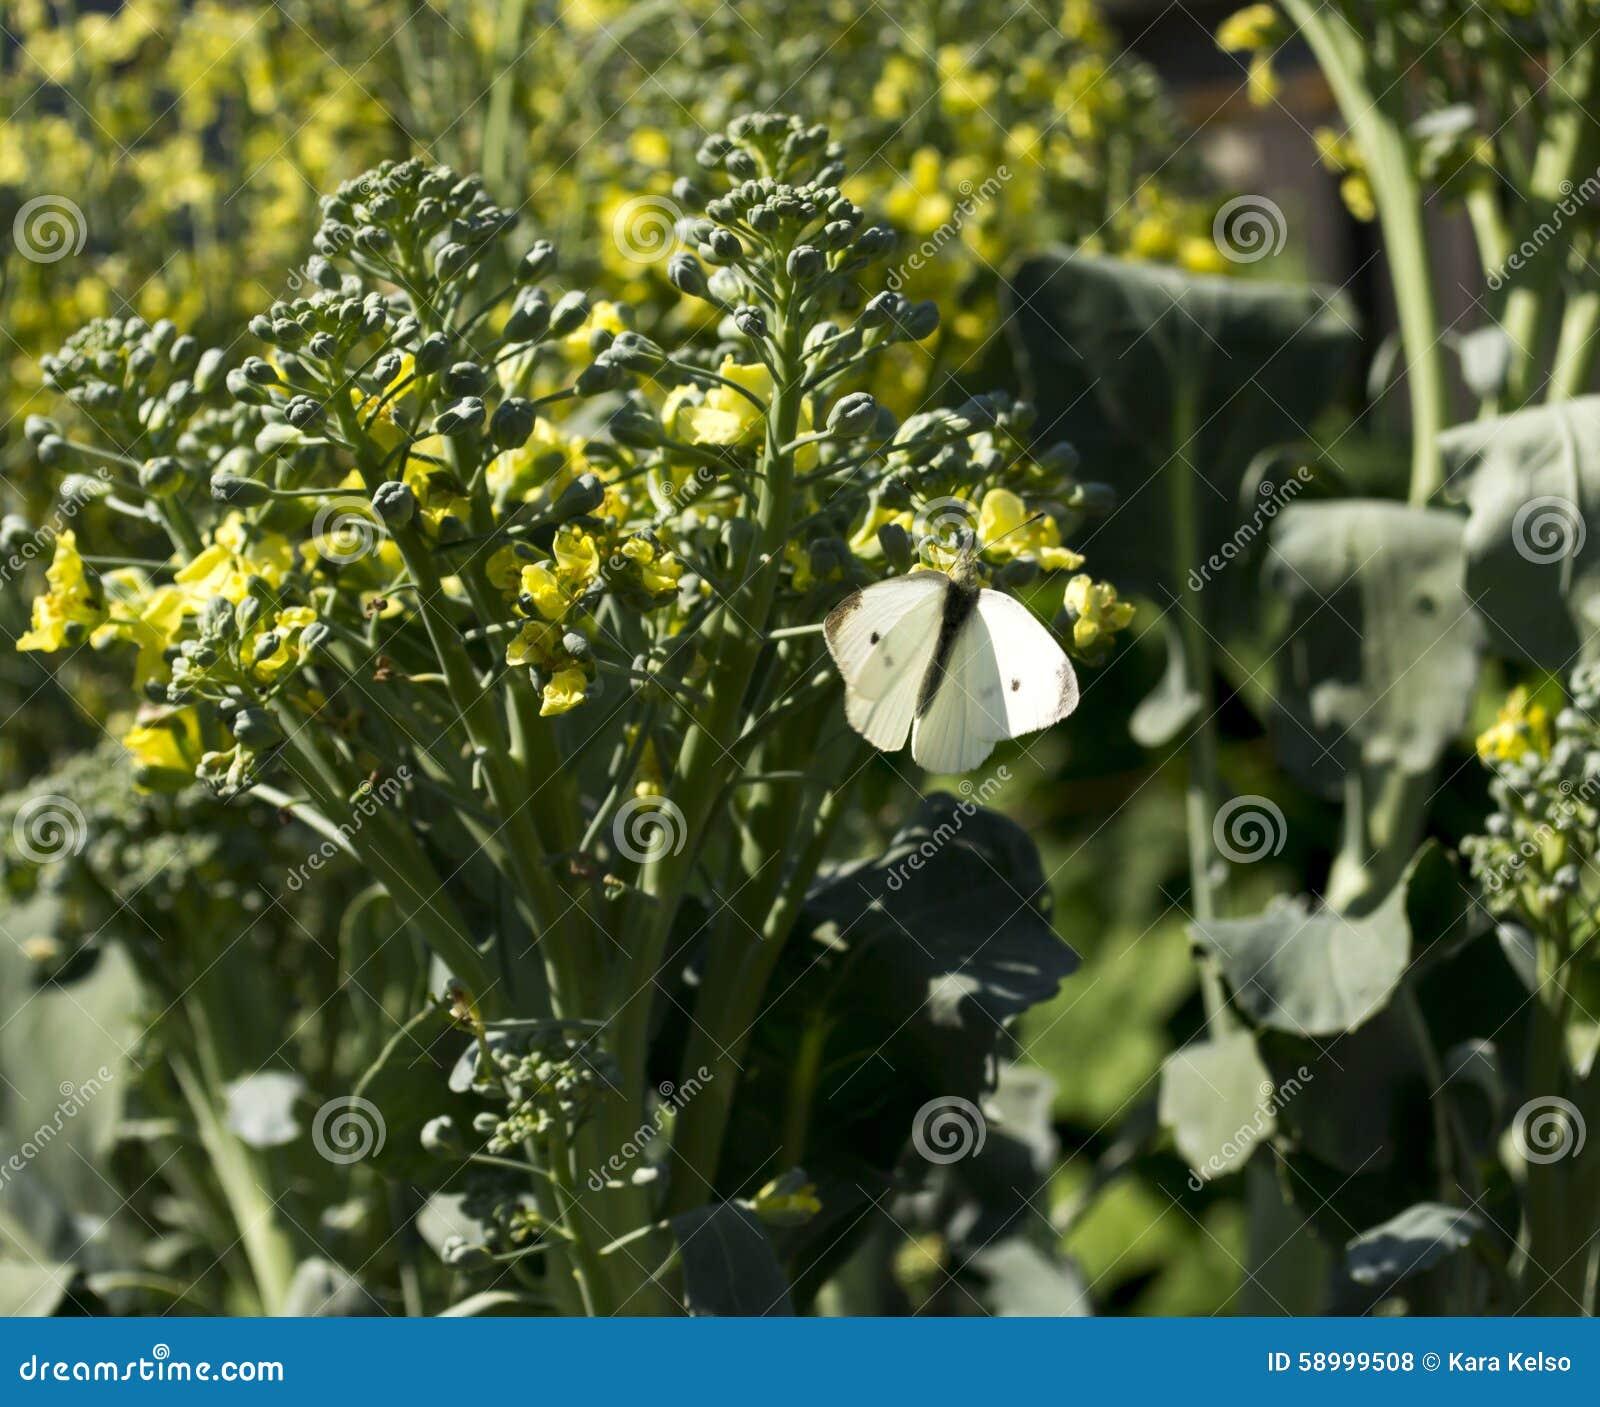 Cabbage Moth On Flowering Broccoli Stalk Stock Photo Image Of